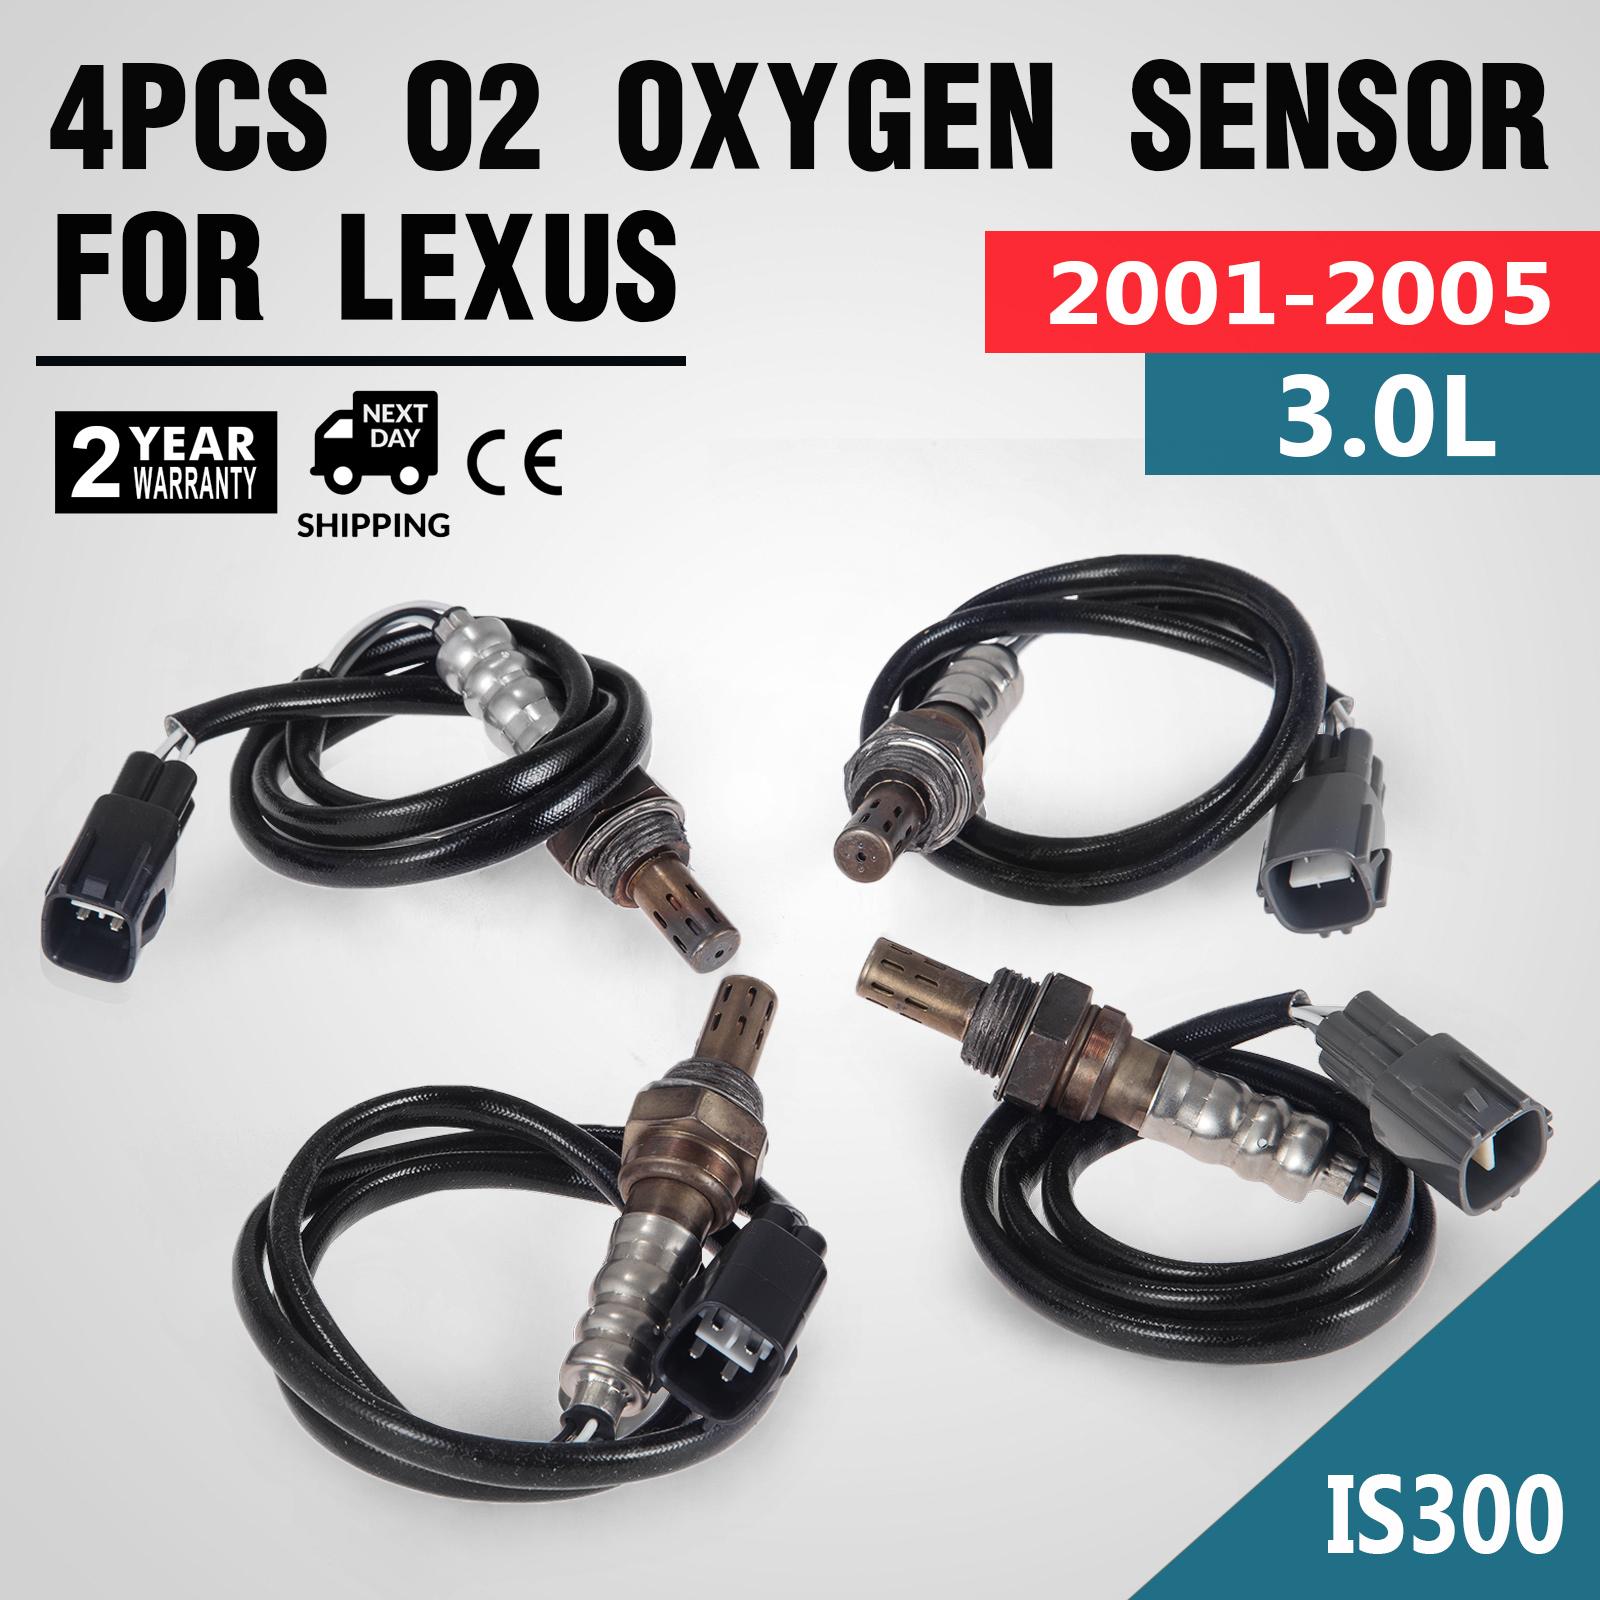 Lambda Oxygen Sensor ZJ38-18-8G1 fits Mazda 2 DE Demio DY 1.3L 1.5L